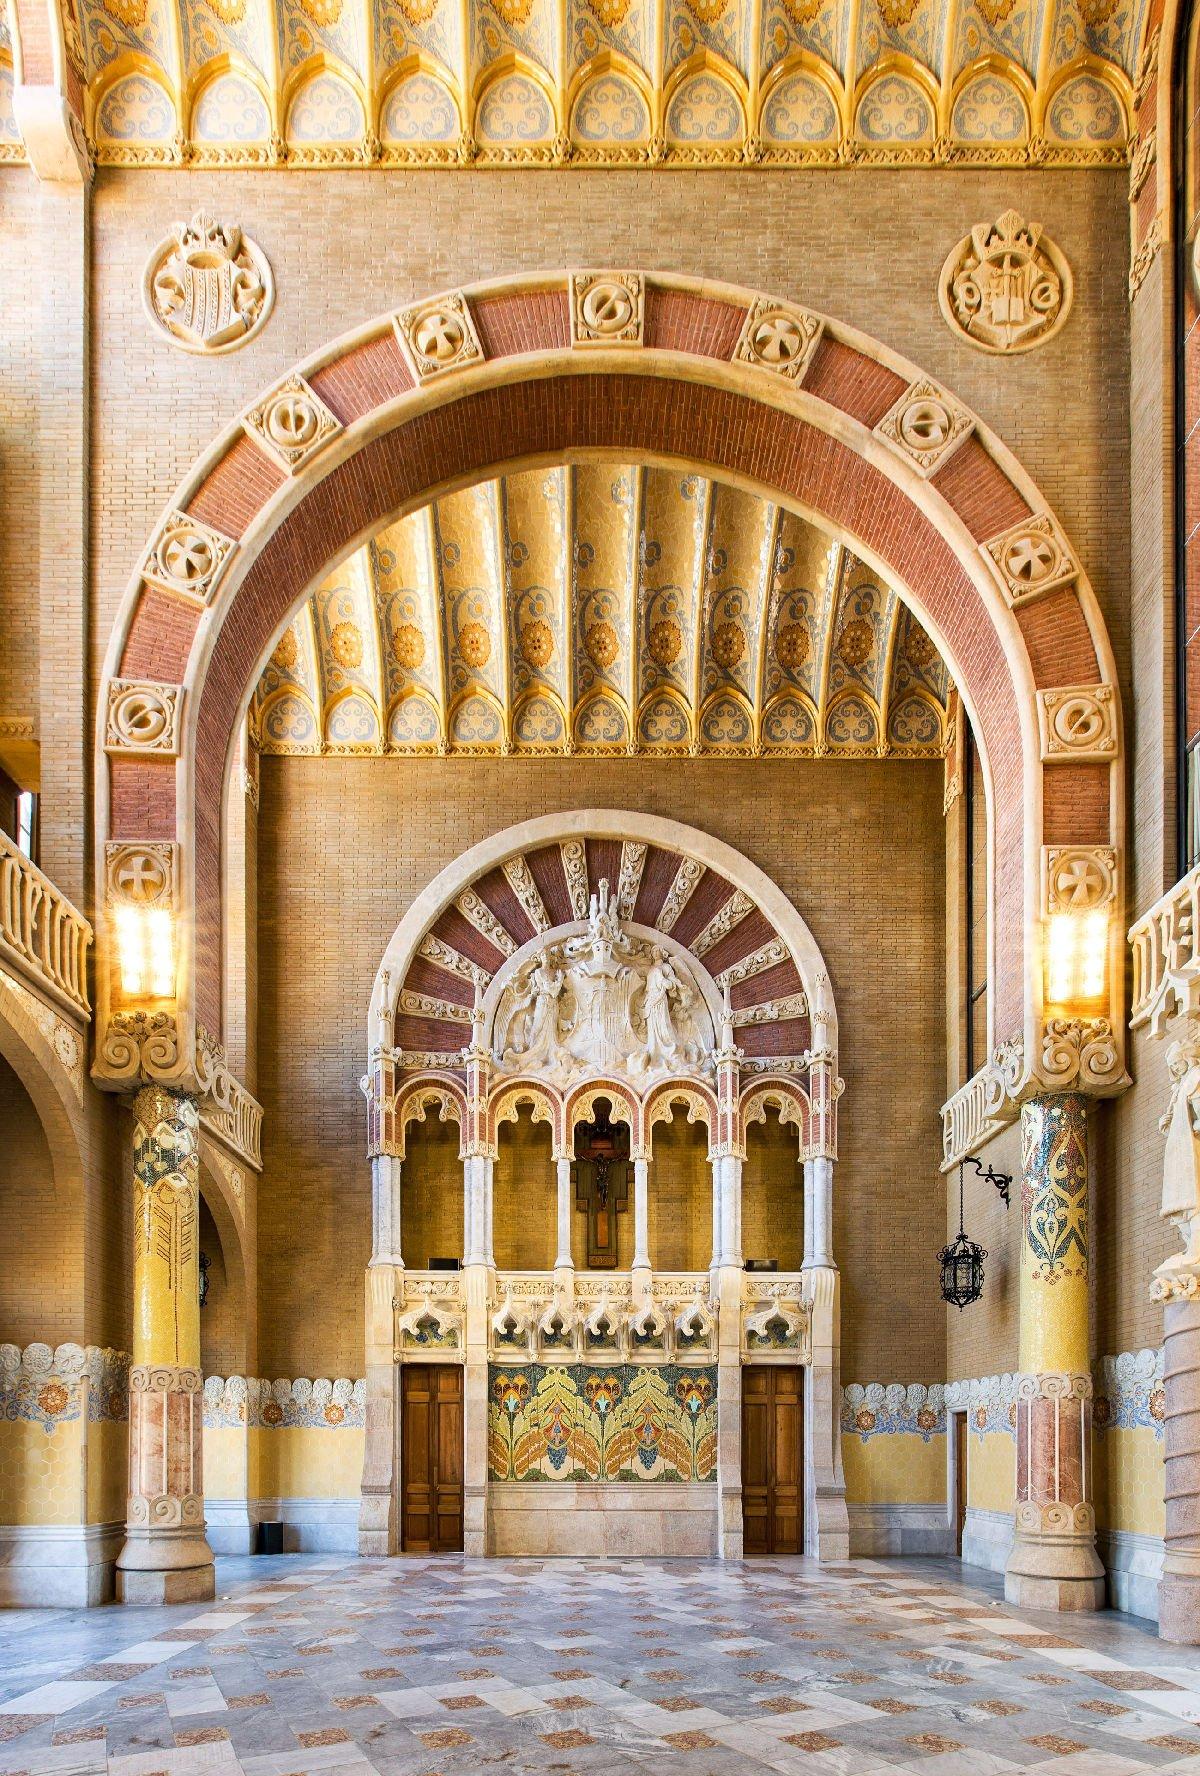 Recinte Modernista, interno padiglione di ingresso